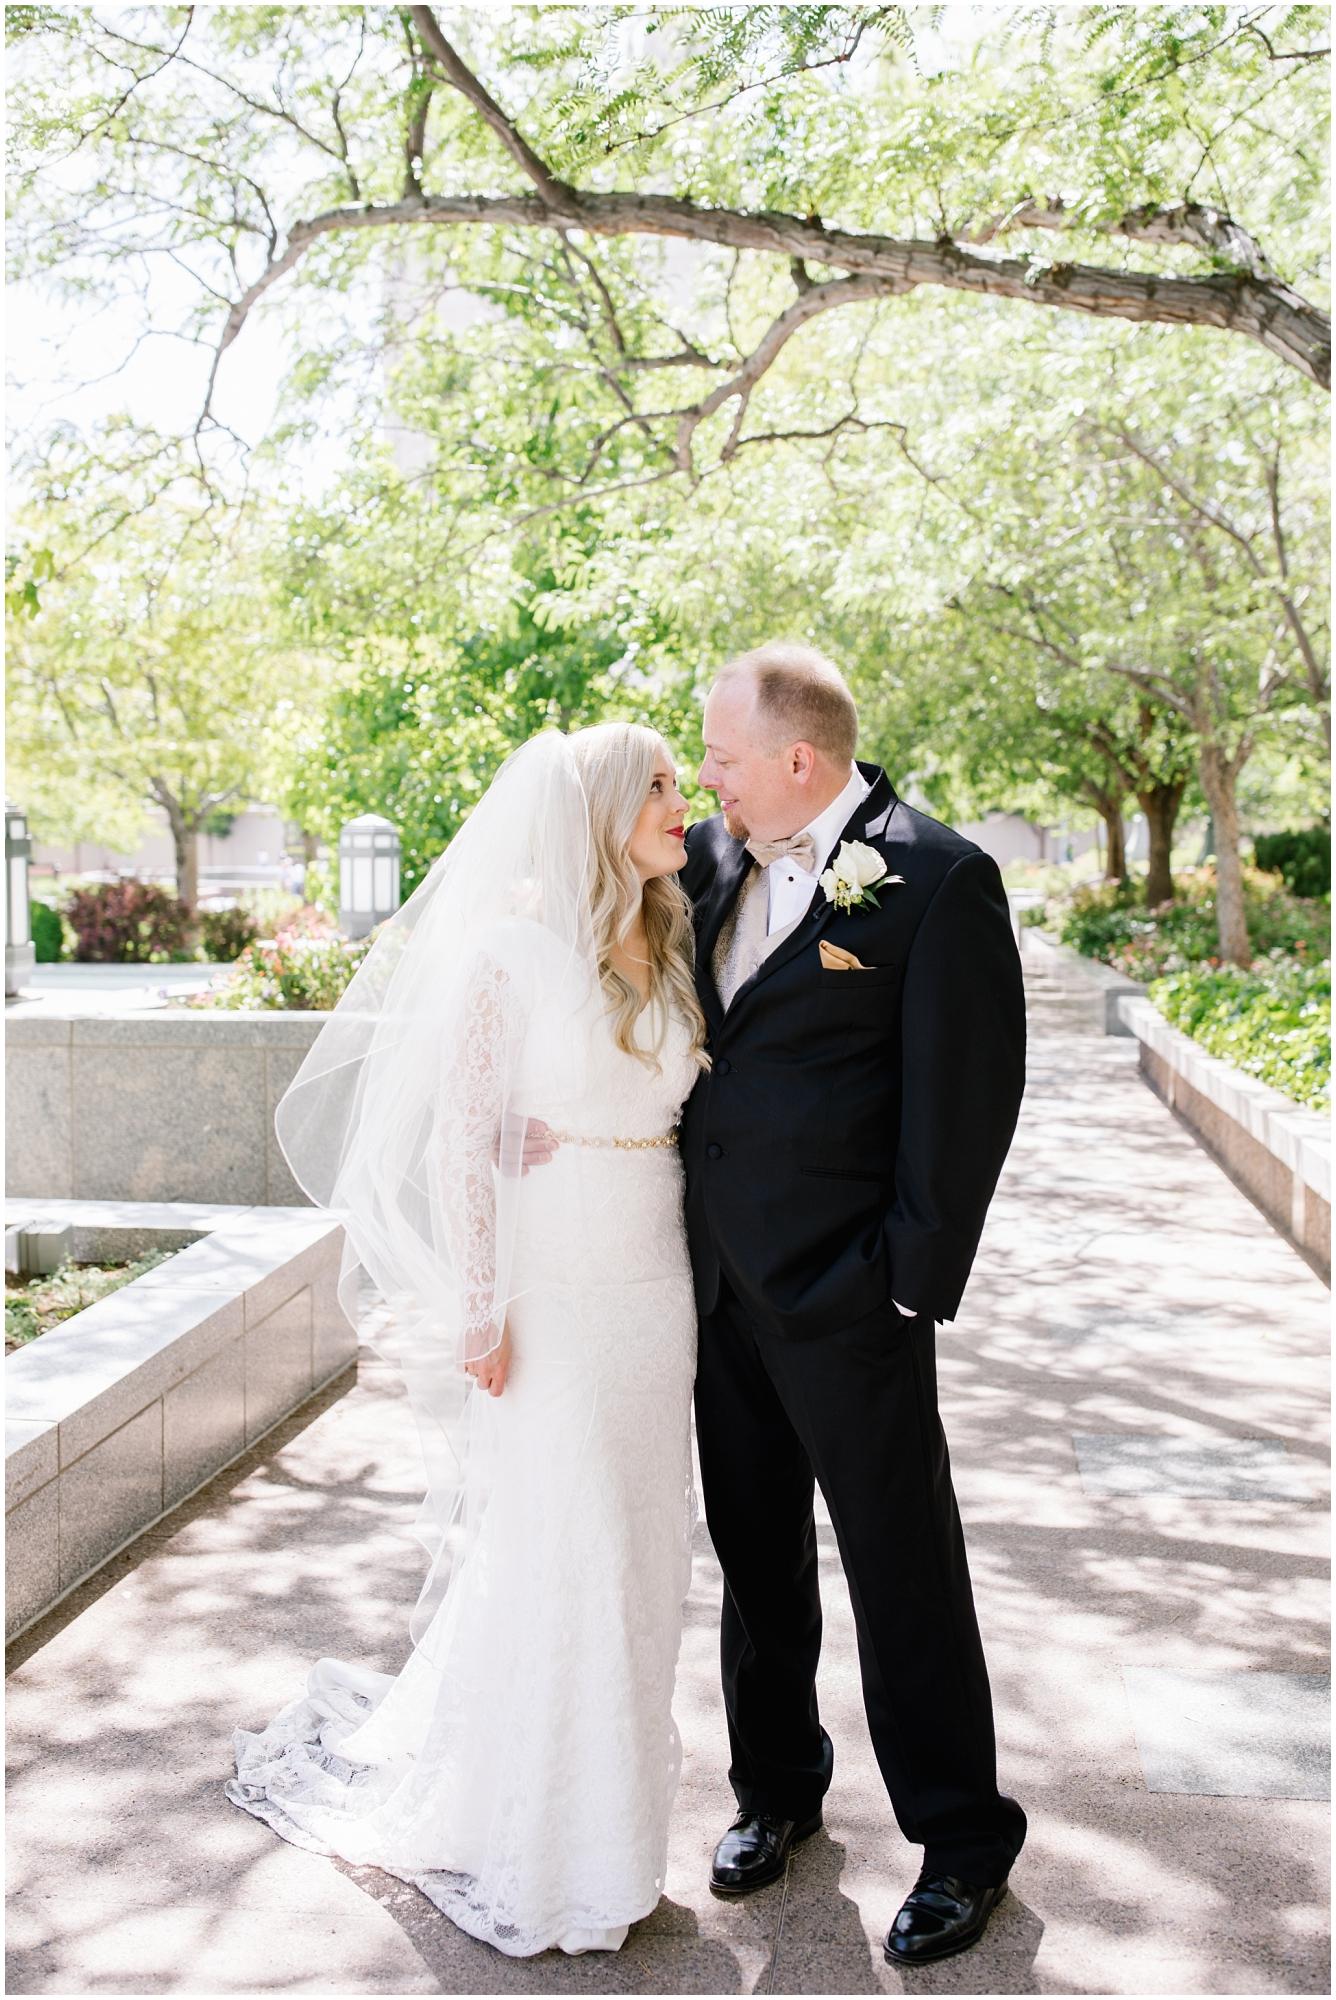 CherylandTyler-319_Lizzie-B-Imagery-Utah-Wedding-Photographer-Park-City-Salt-Lake-City-Temple-Wells-Fargo-Building.jpg